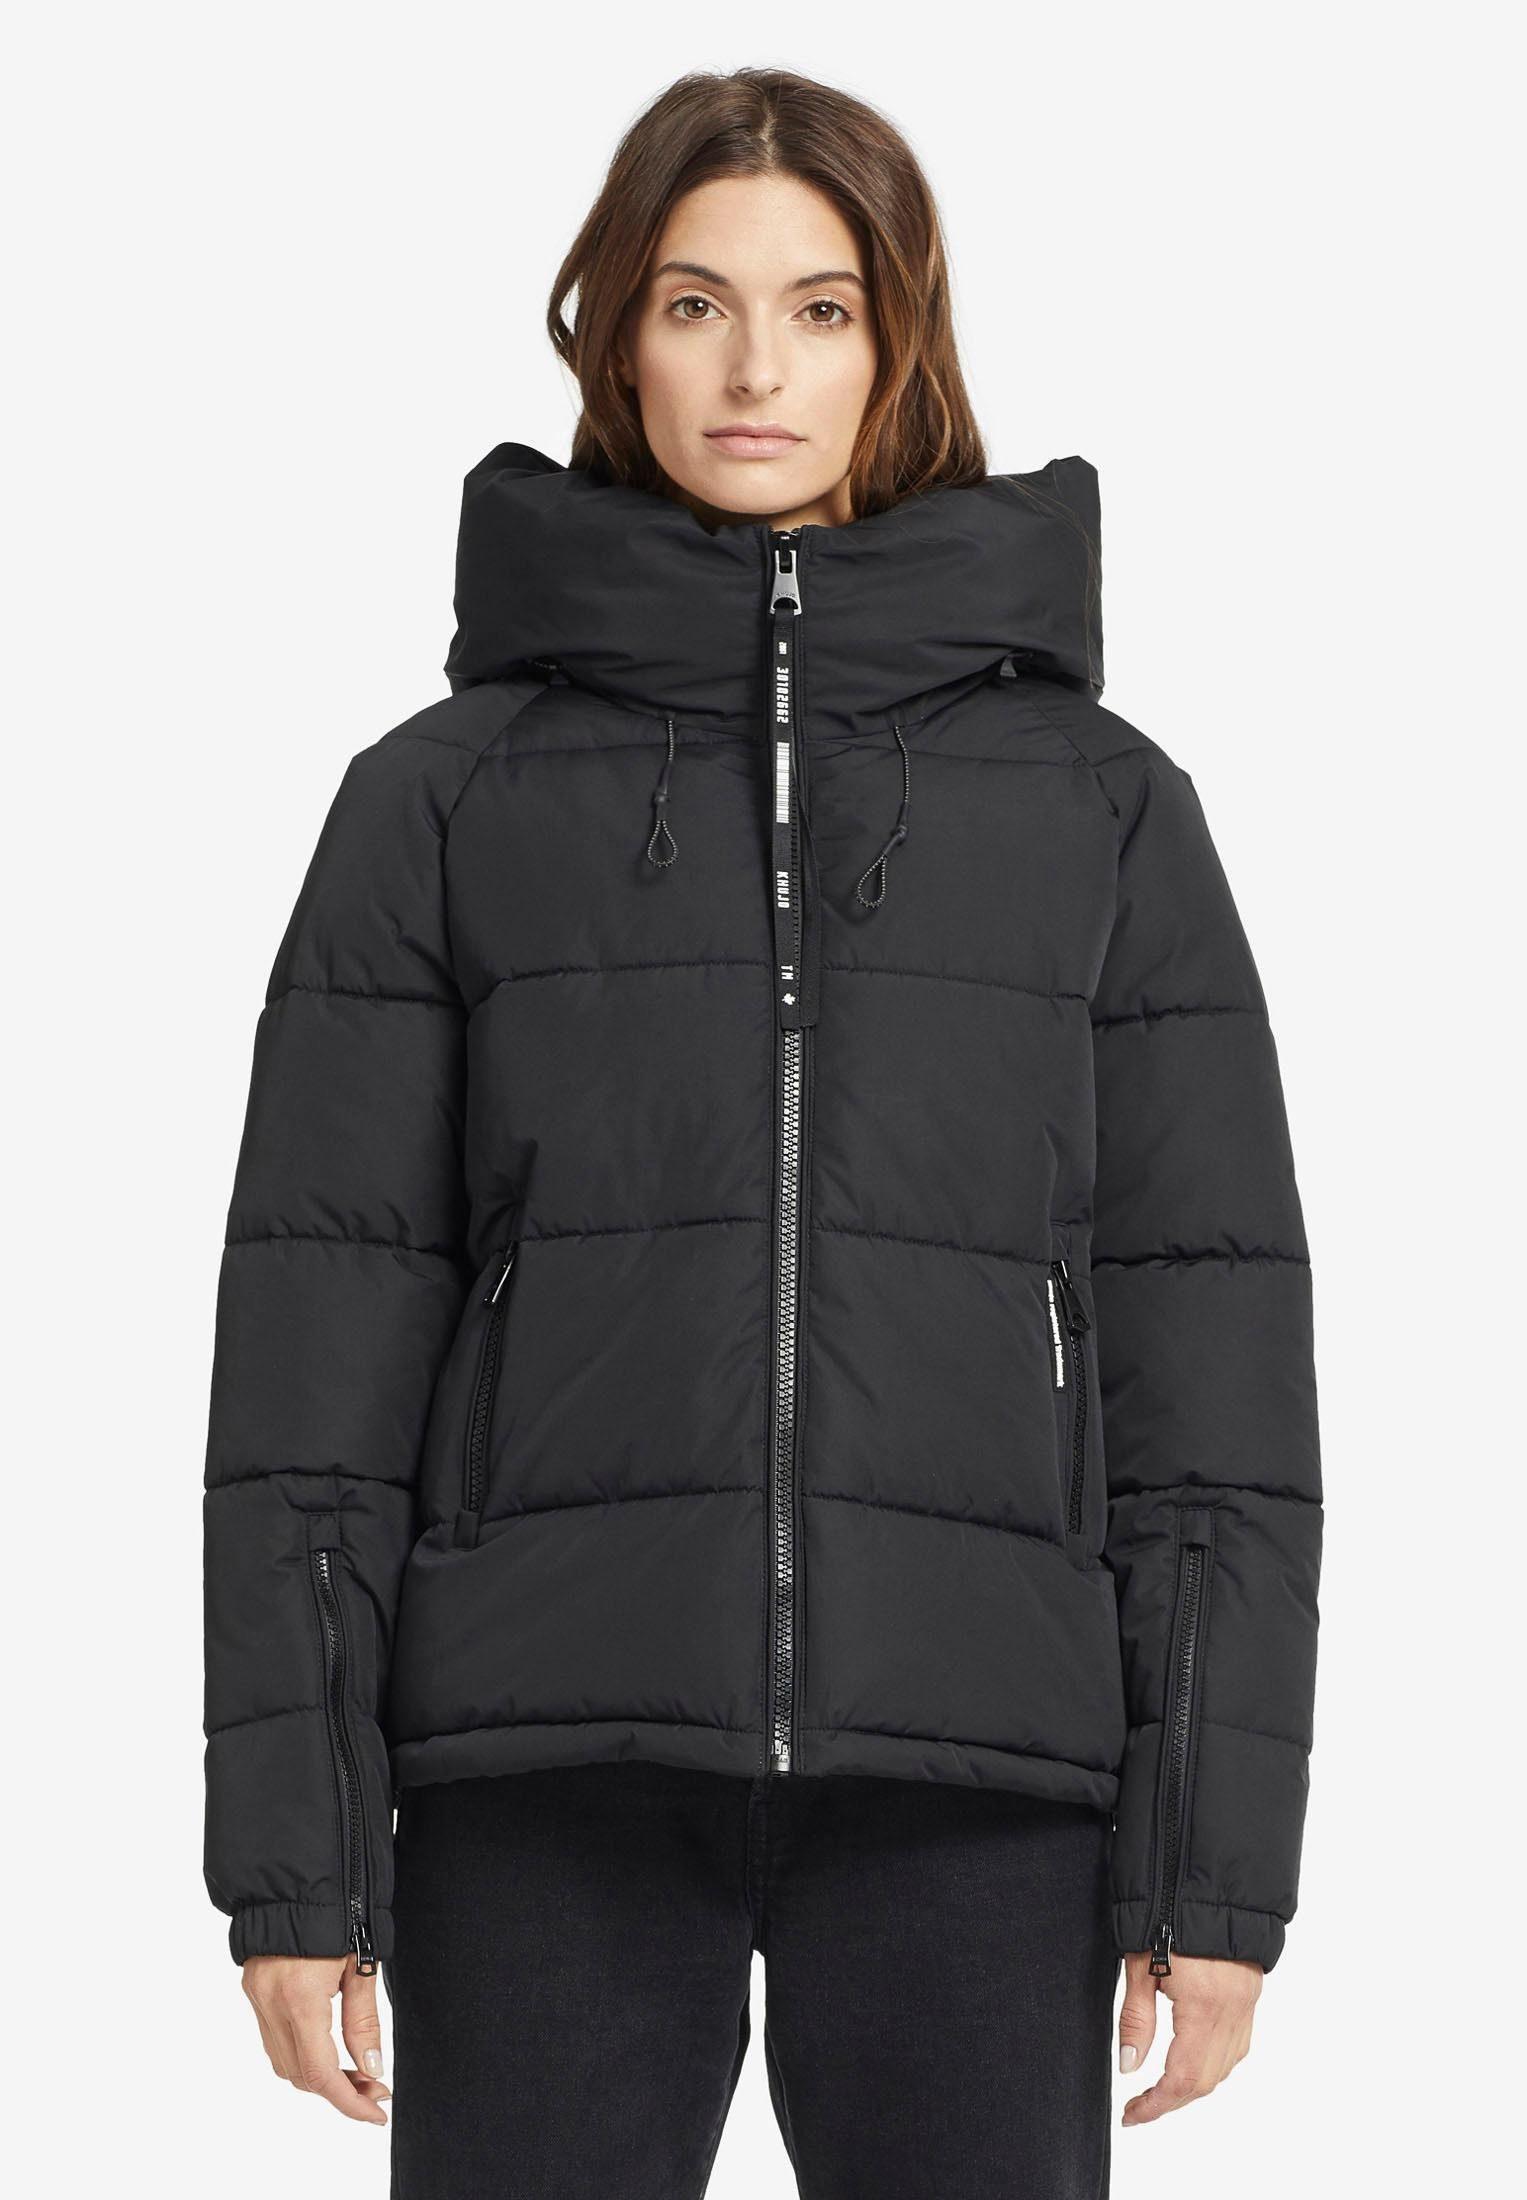 khujo Steppjacke »ALEXIA« stylische Damen Winterjacke mit Kapuze online kaufen | OTTO